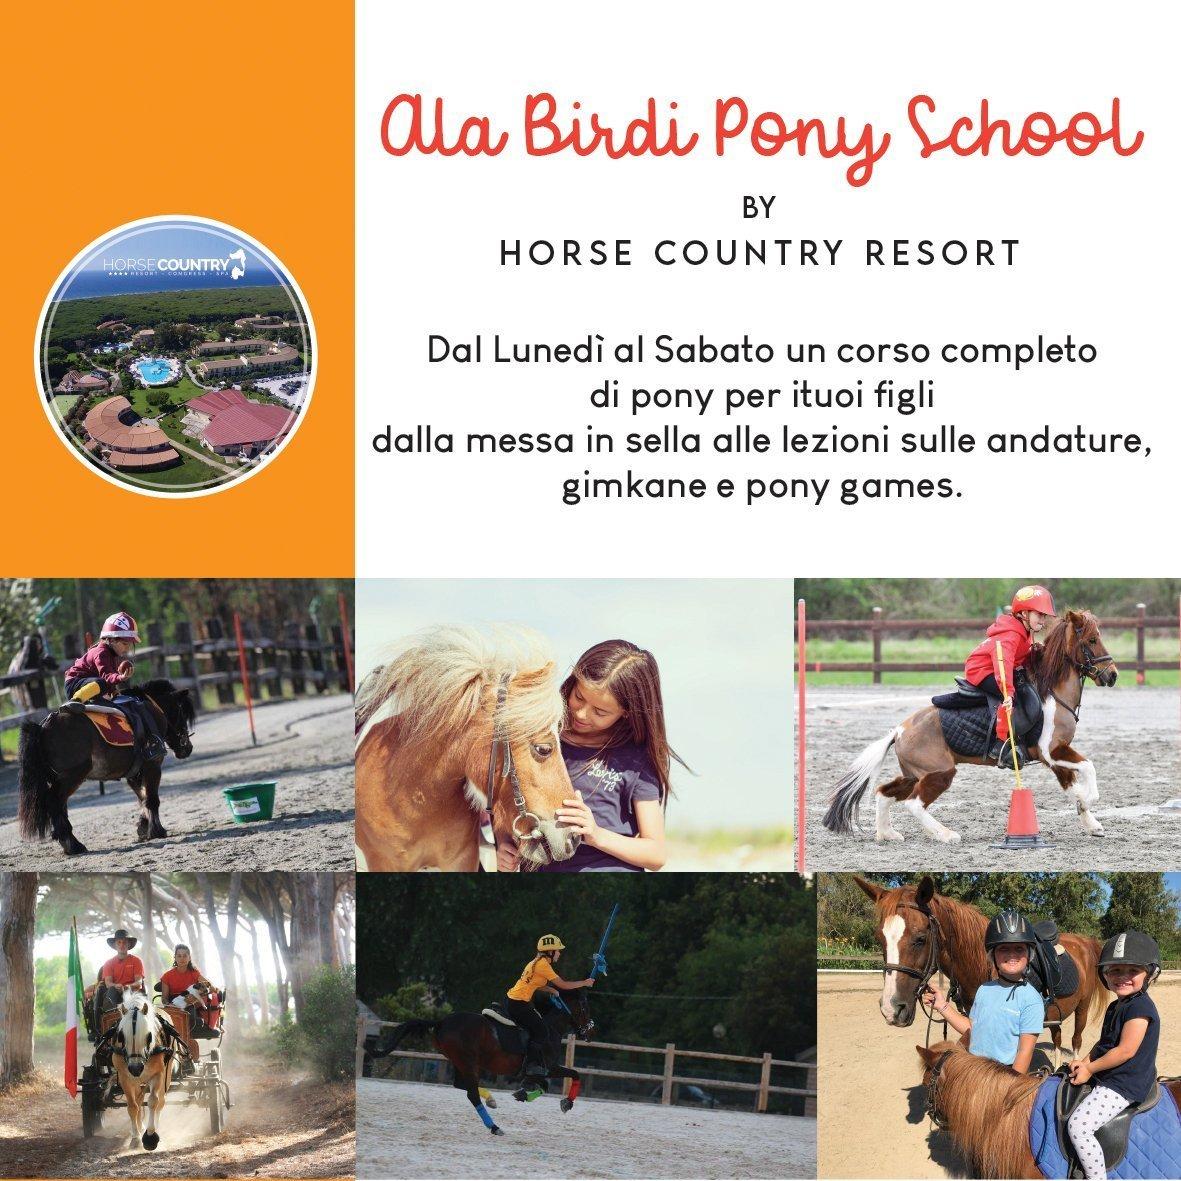 Pony School e Pony Games